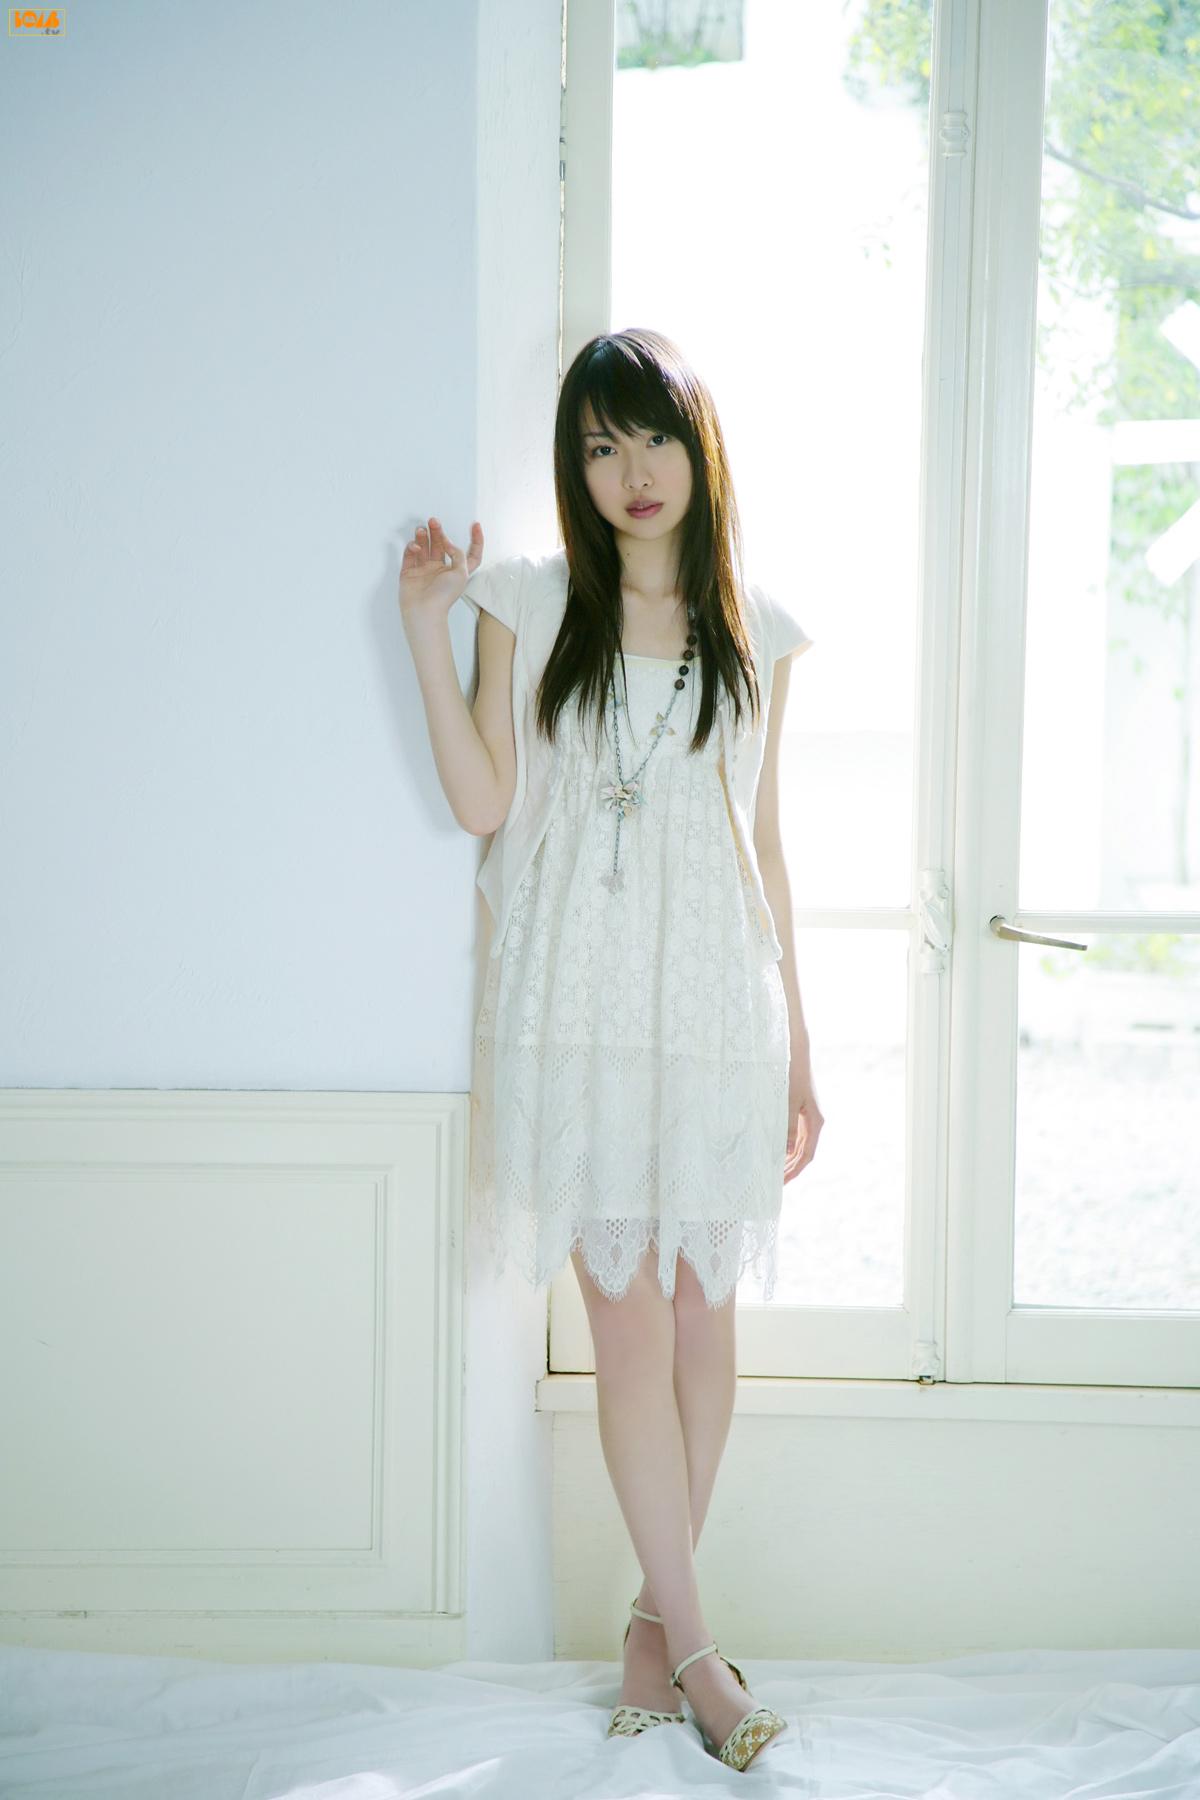 [FSo] Erika Toda - Bomb.tv 戸田恵梨香 [2007.05][49.19 MB]